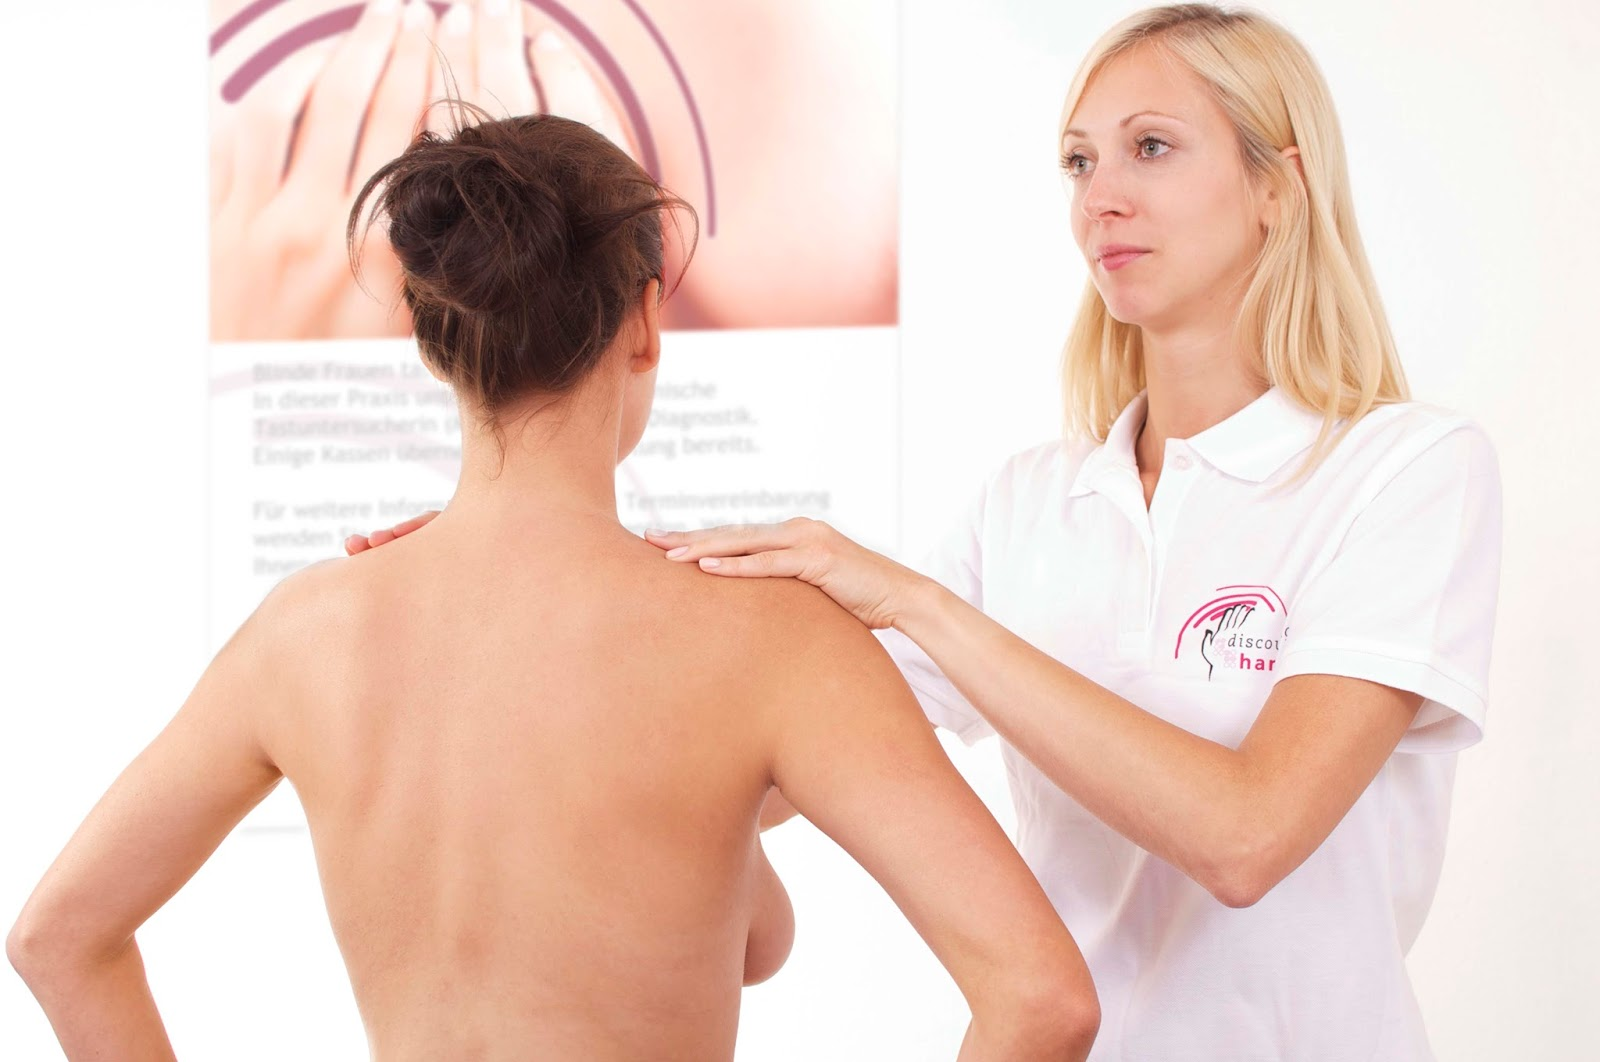 Tastuntersuchung Brustkrebsvorsorge